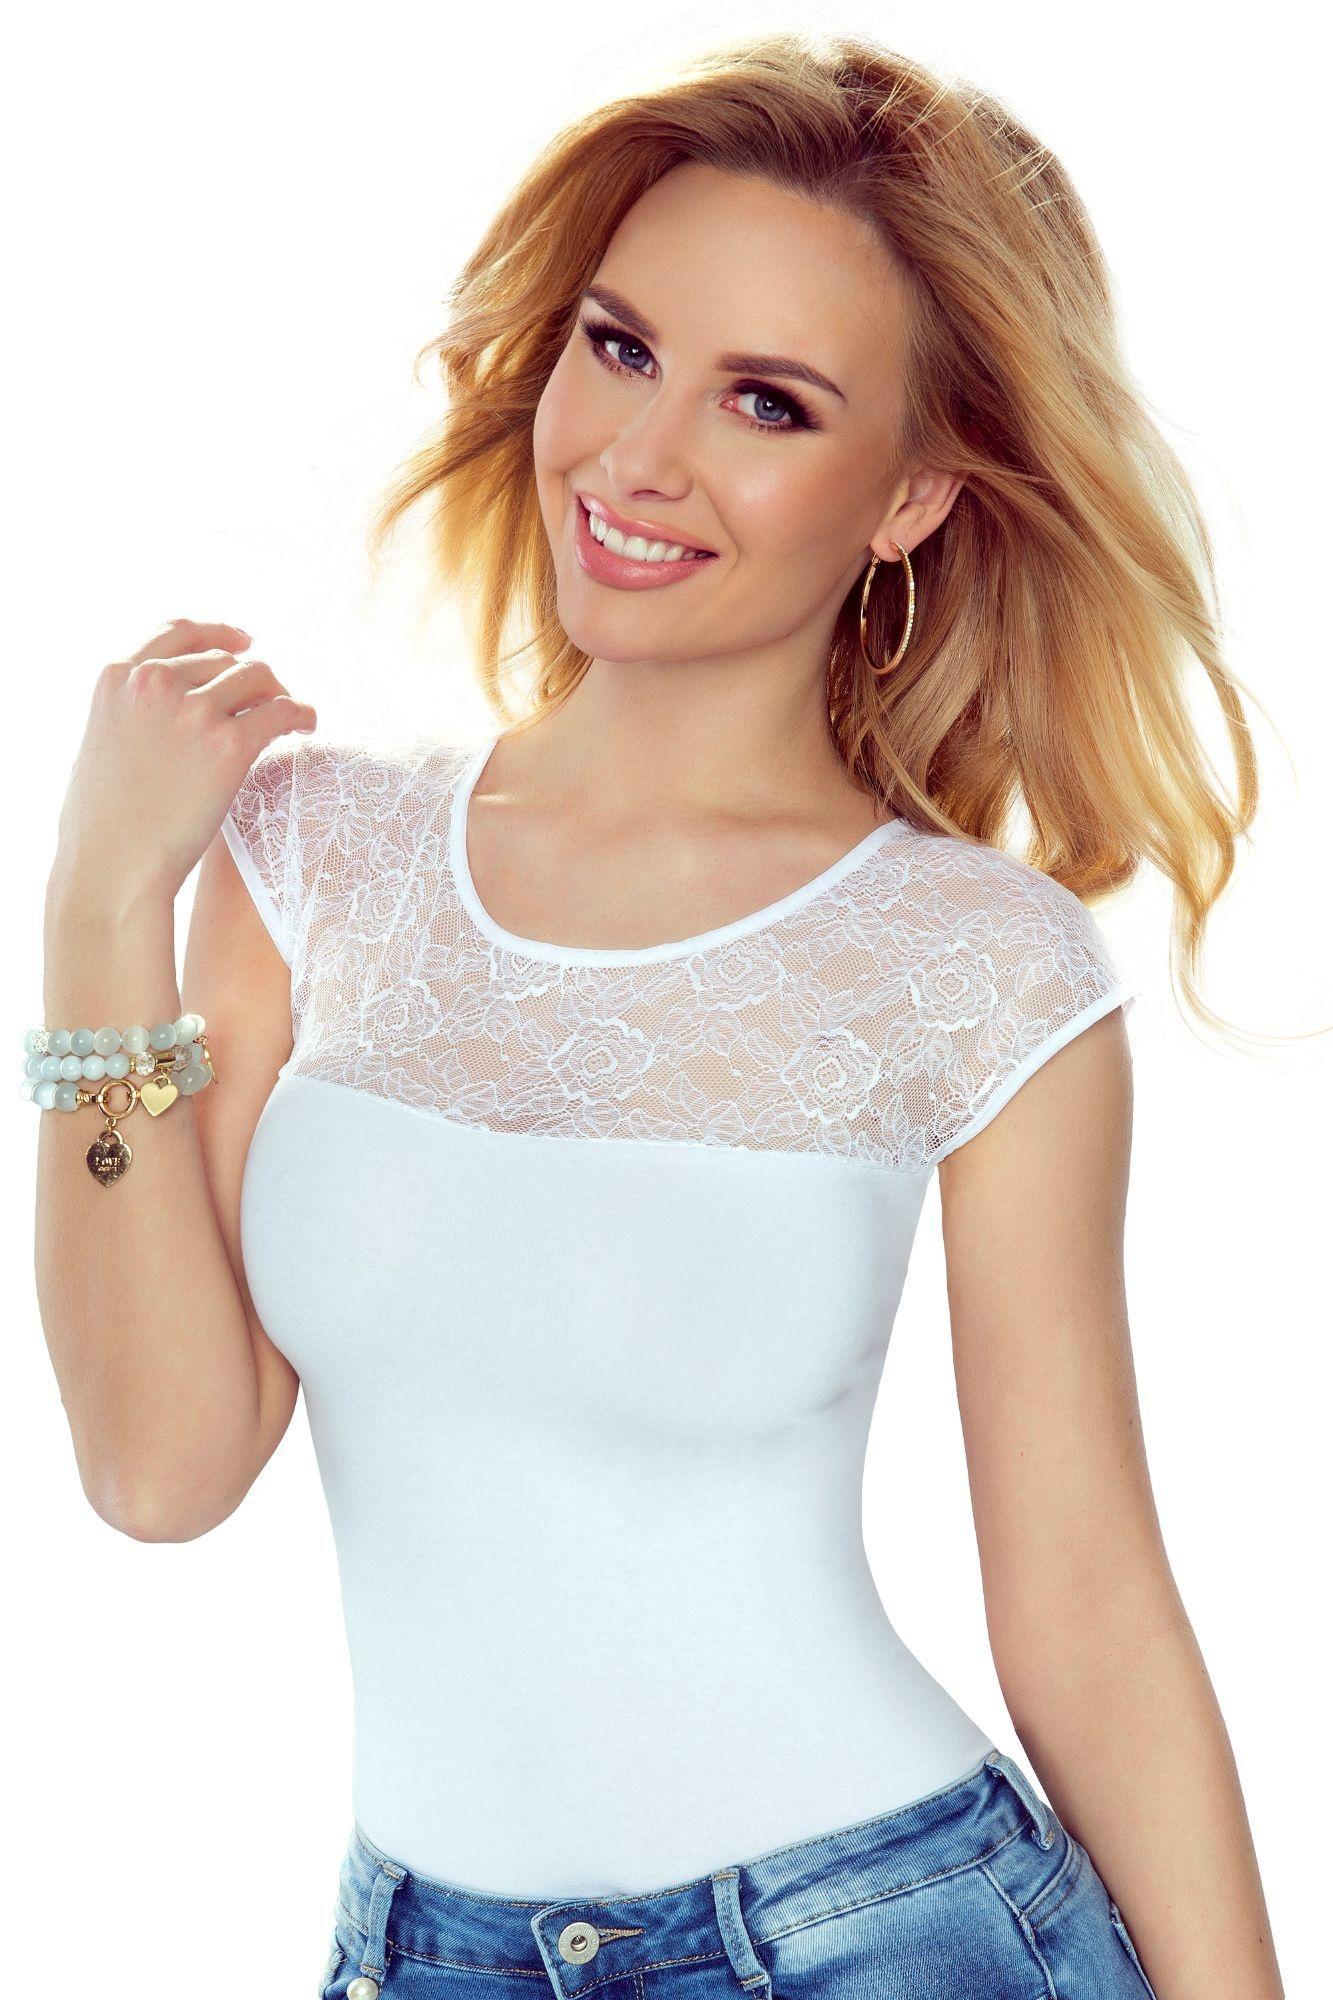 15401ec0e7bc Dámské triko Paulina bílé s krajkovým dekoltem